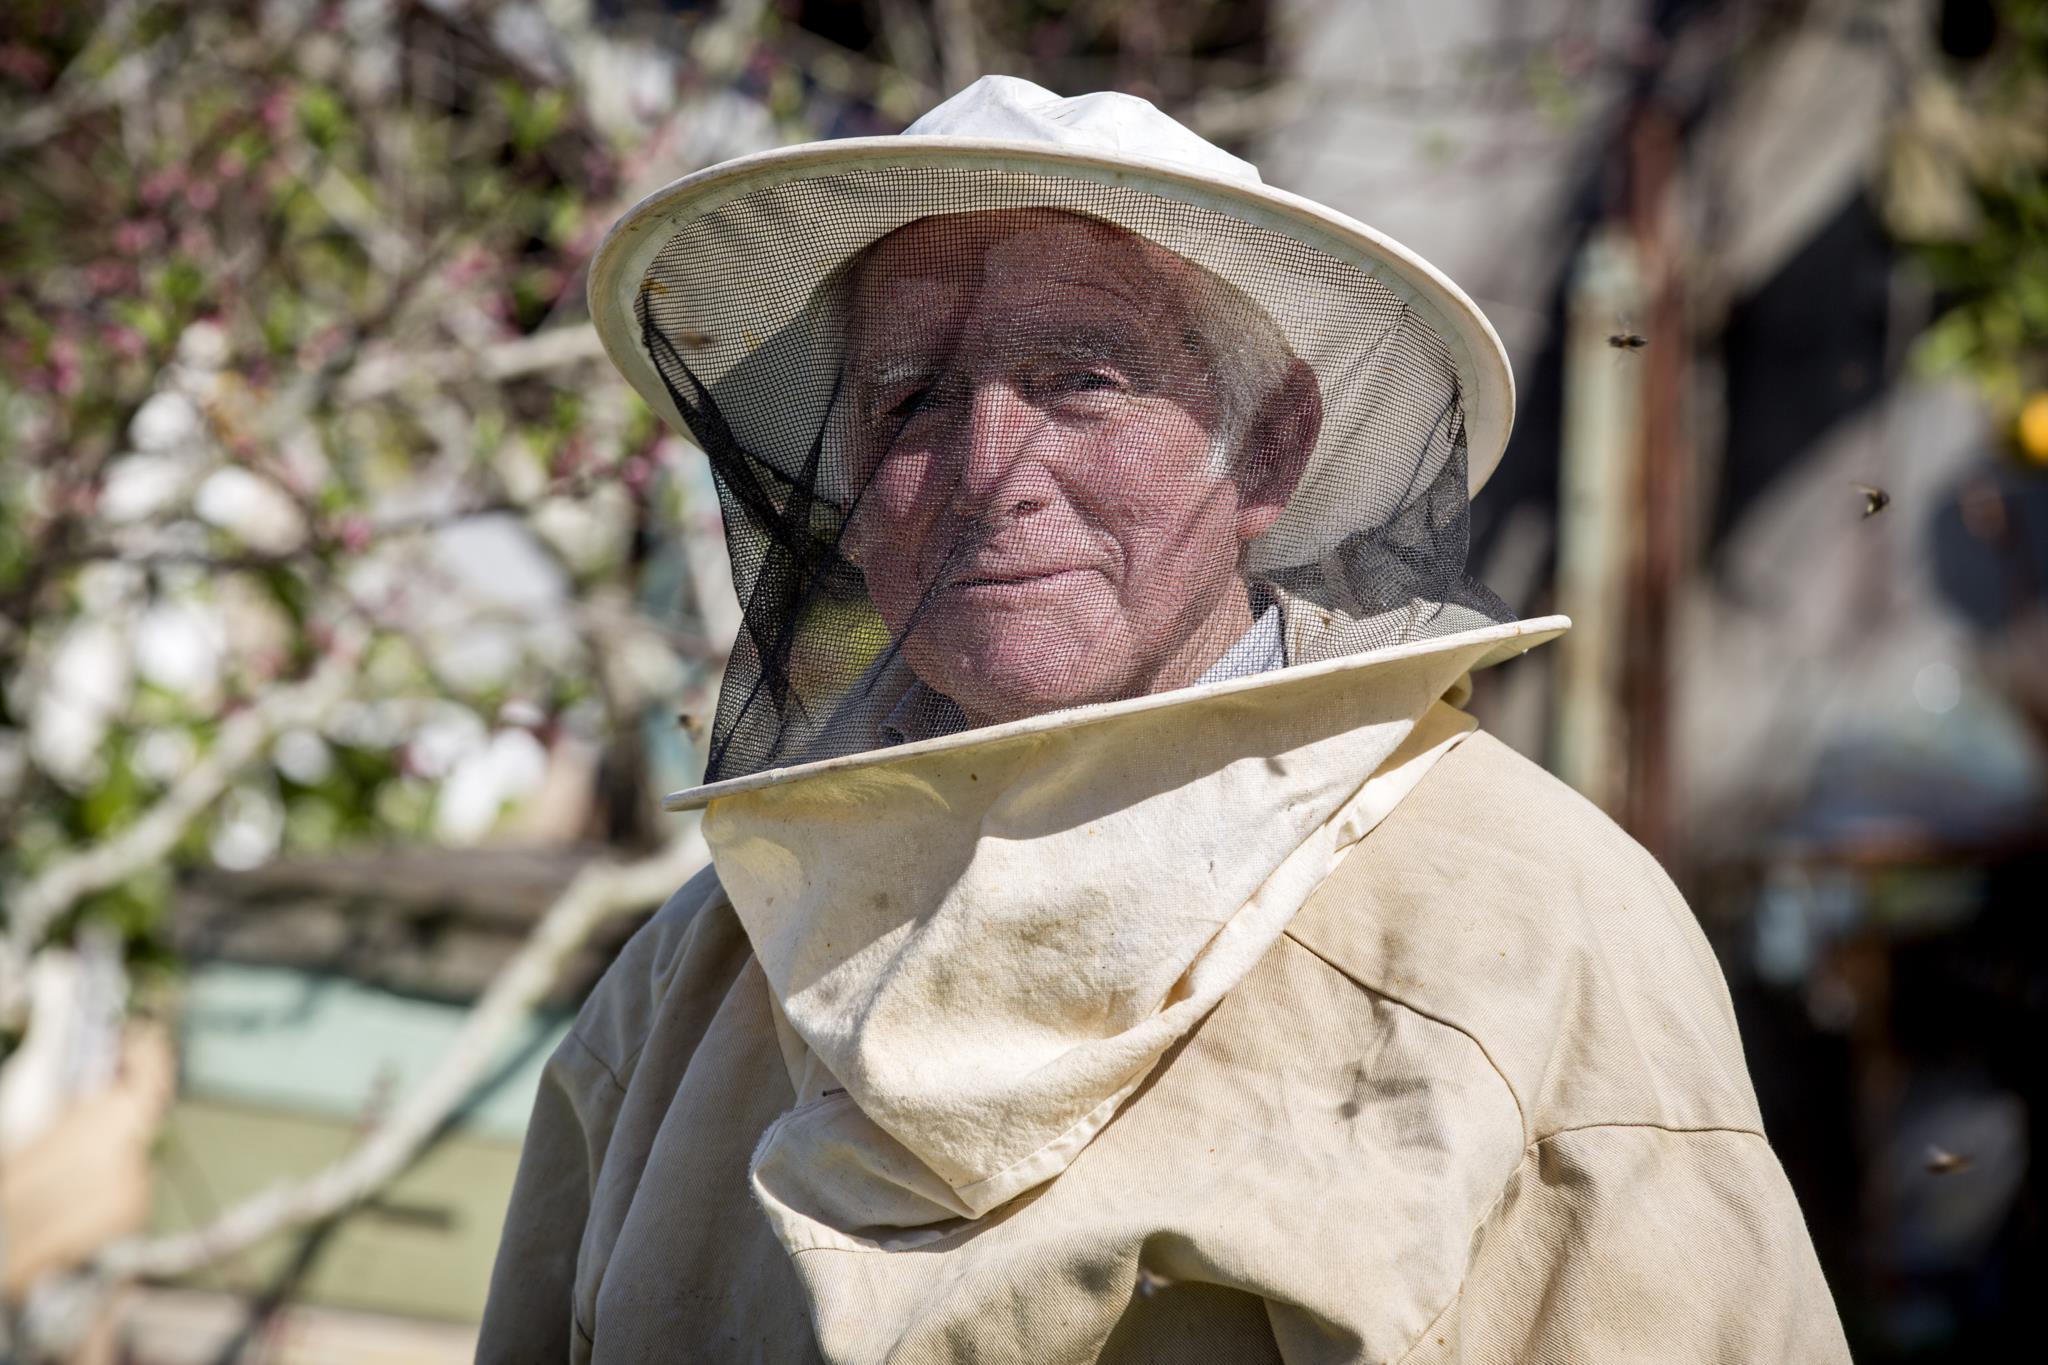 Alberto Caetano Tomas é apicultor e produtor de mel da Mel do Forno